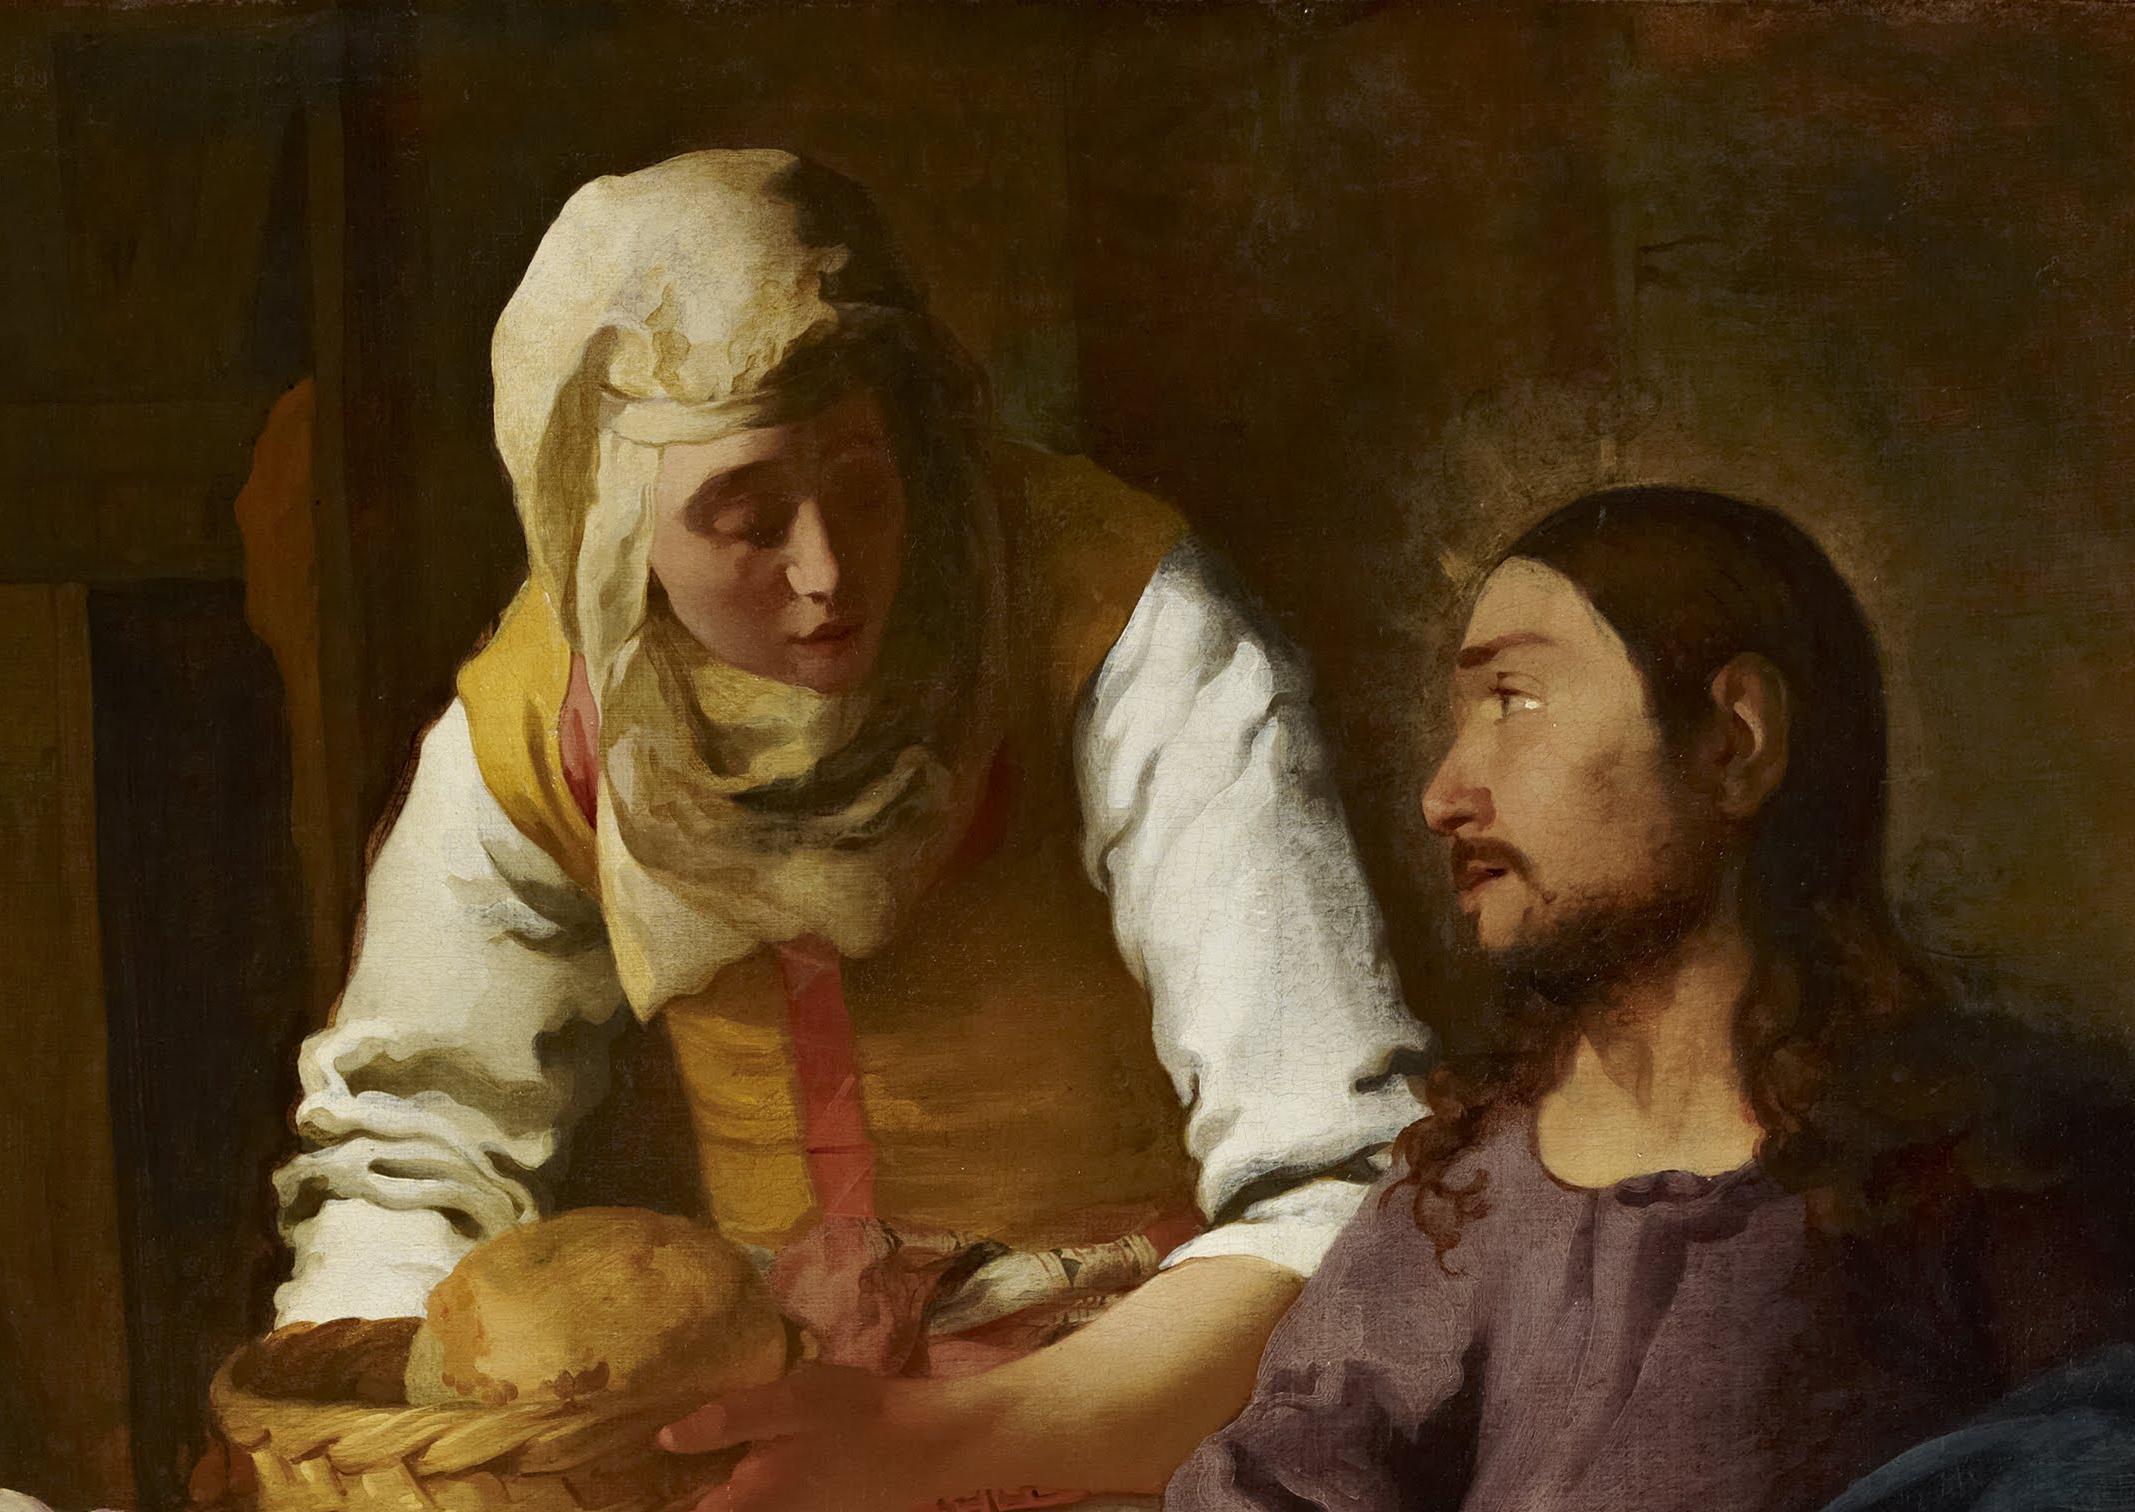 Vermeer ©Wikimedia